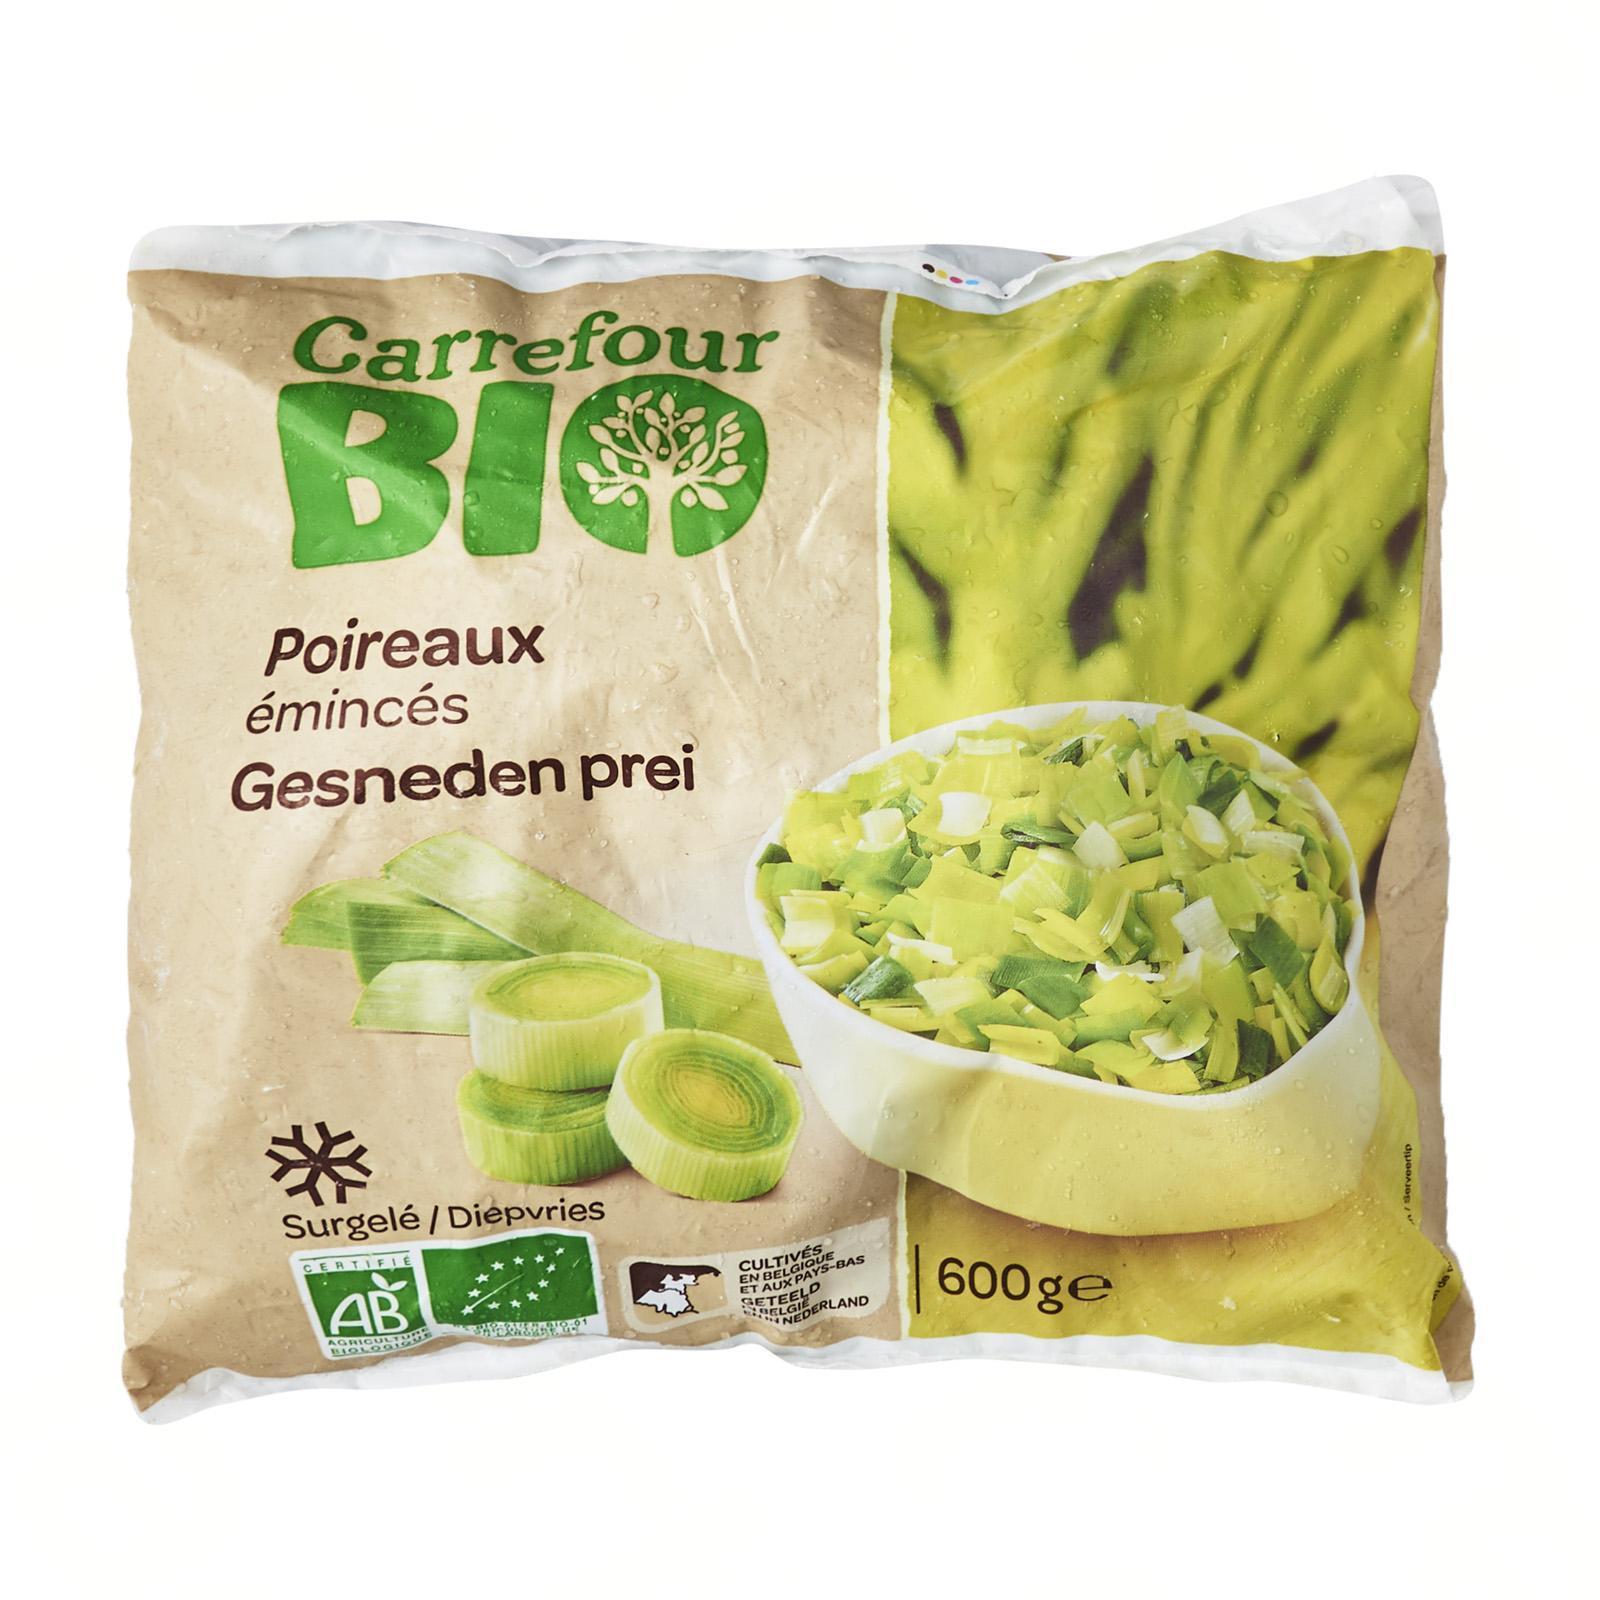 Carrefour Organic Sliced Leeks - Frozen - By Le Petit Depot